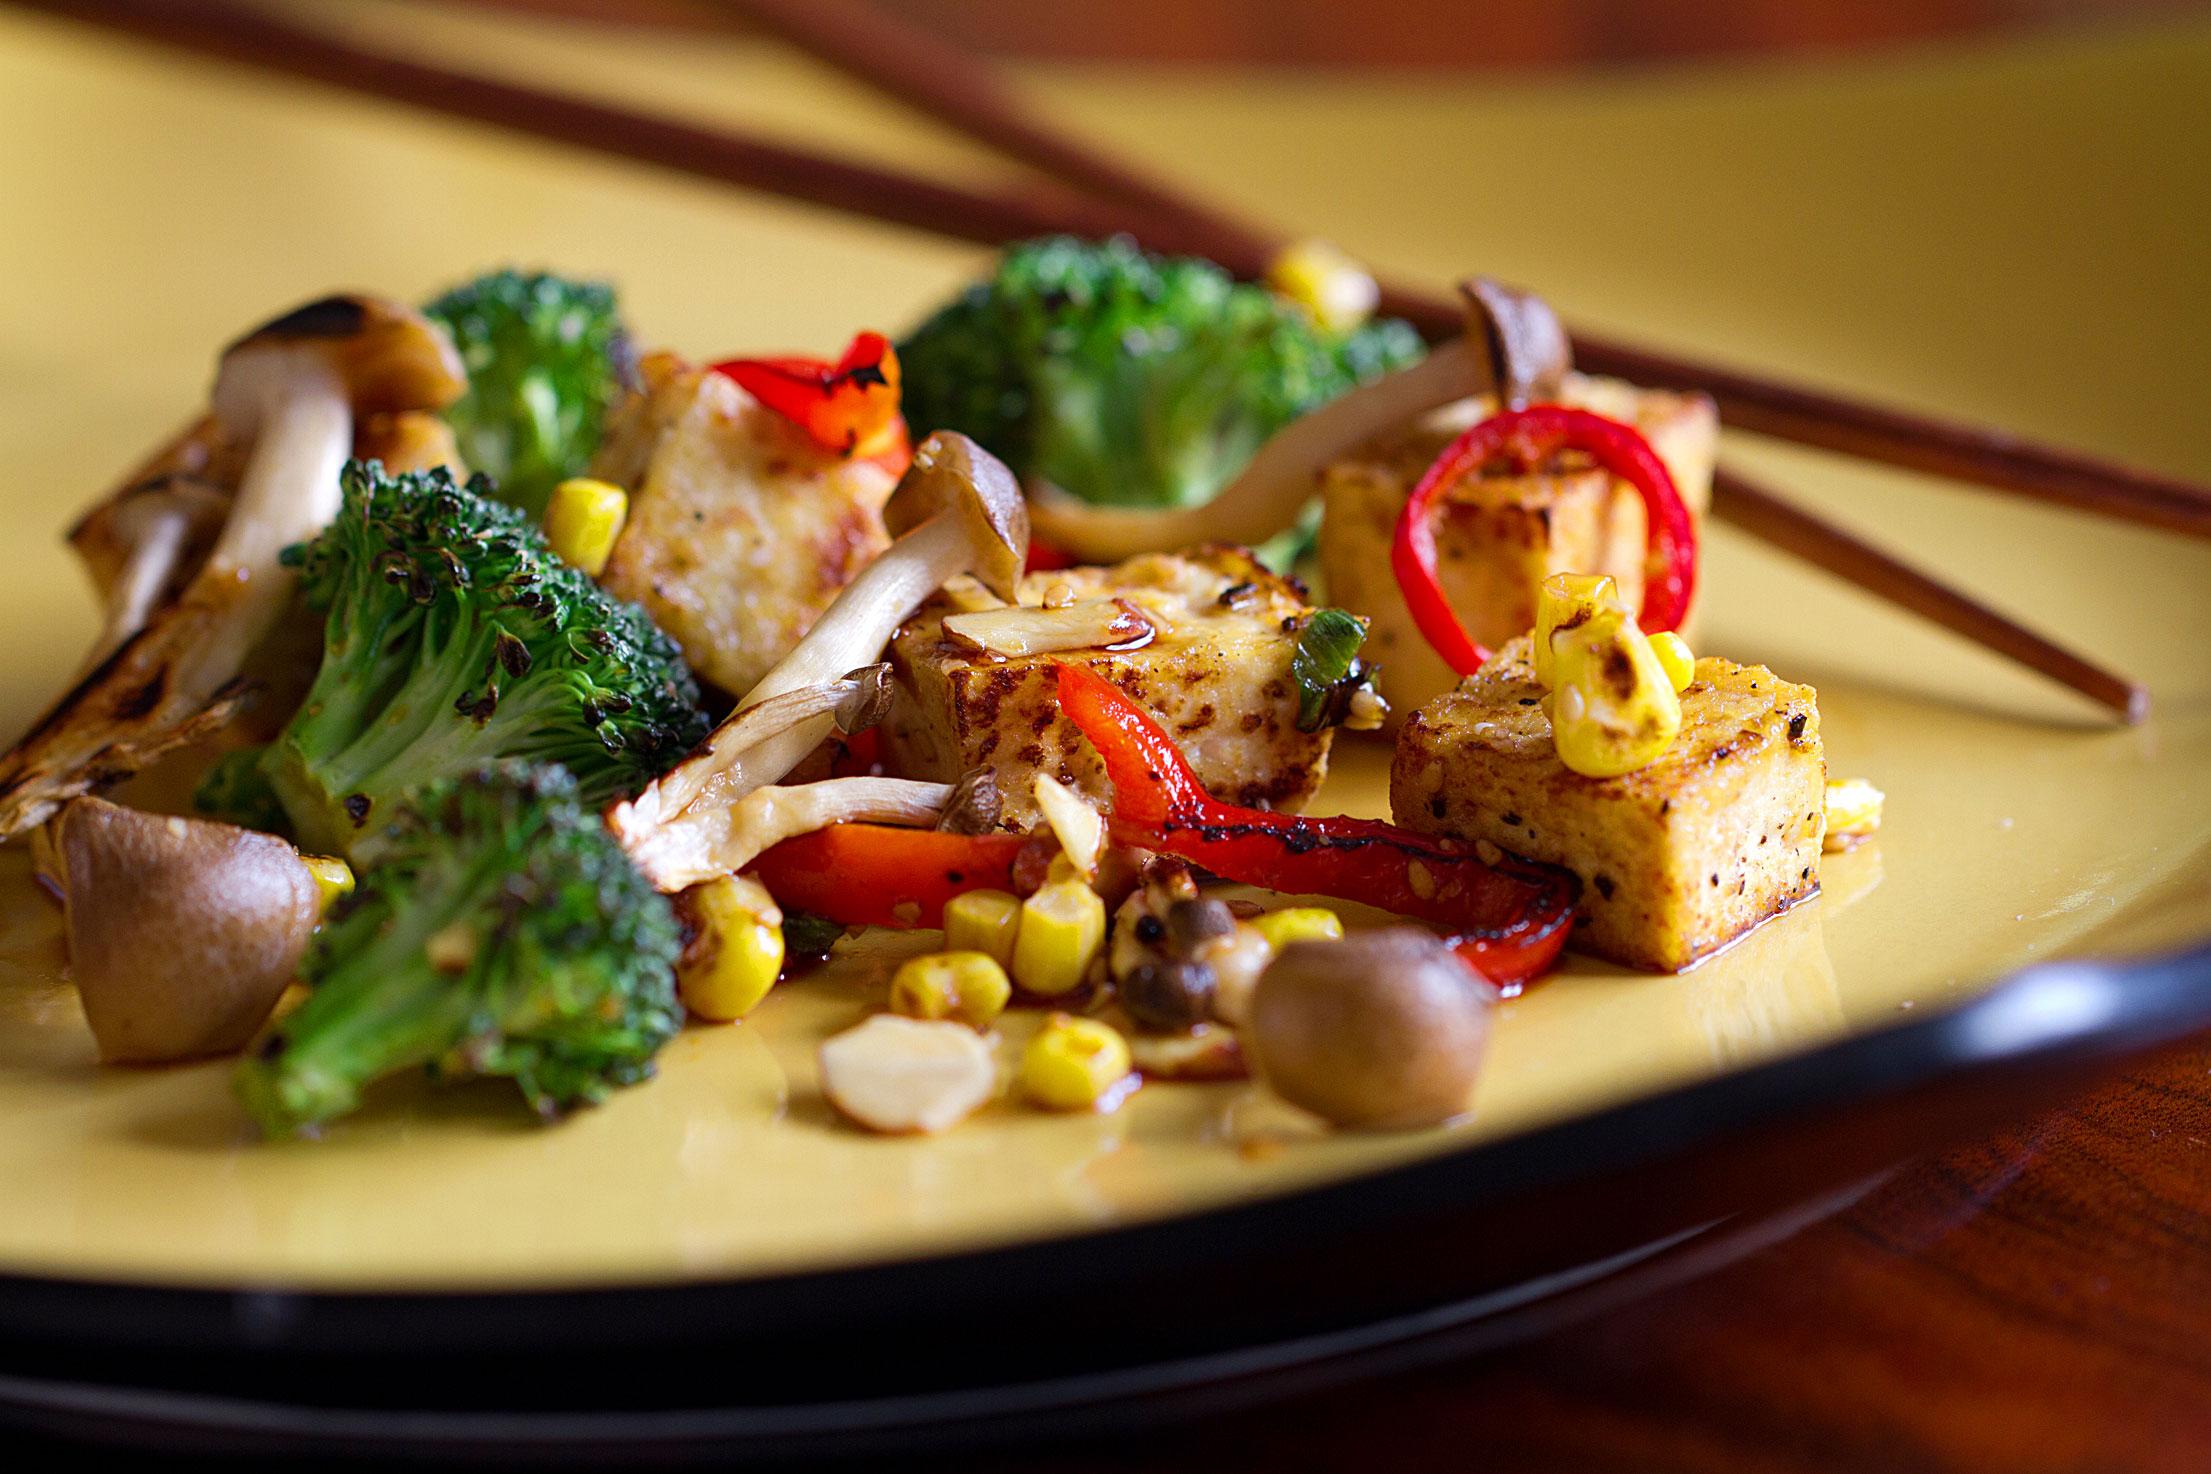 Tofu Stir-Fry with Veggies and Beech Mushrooms